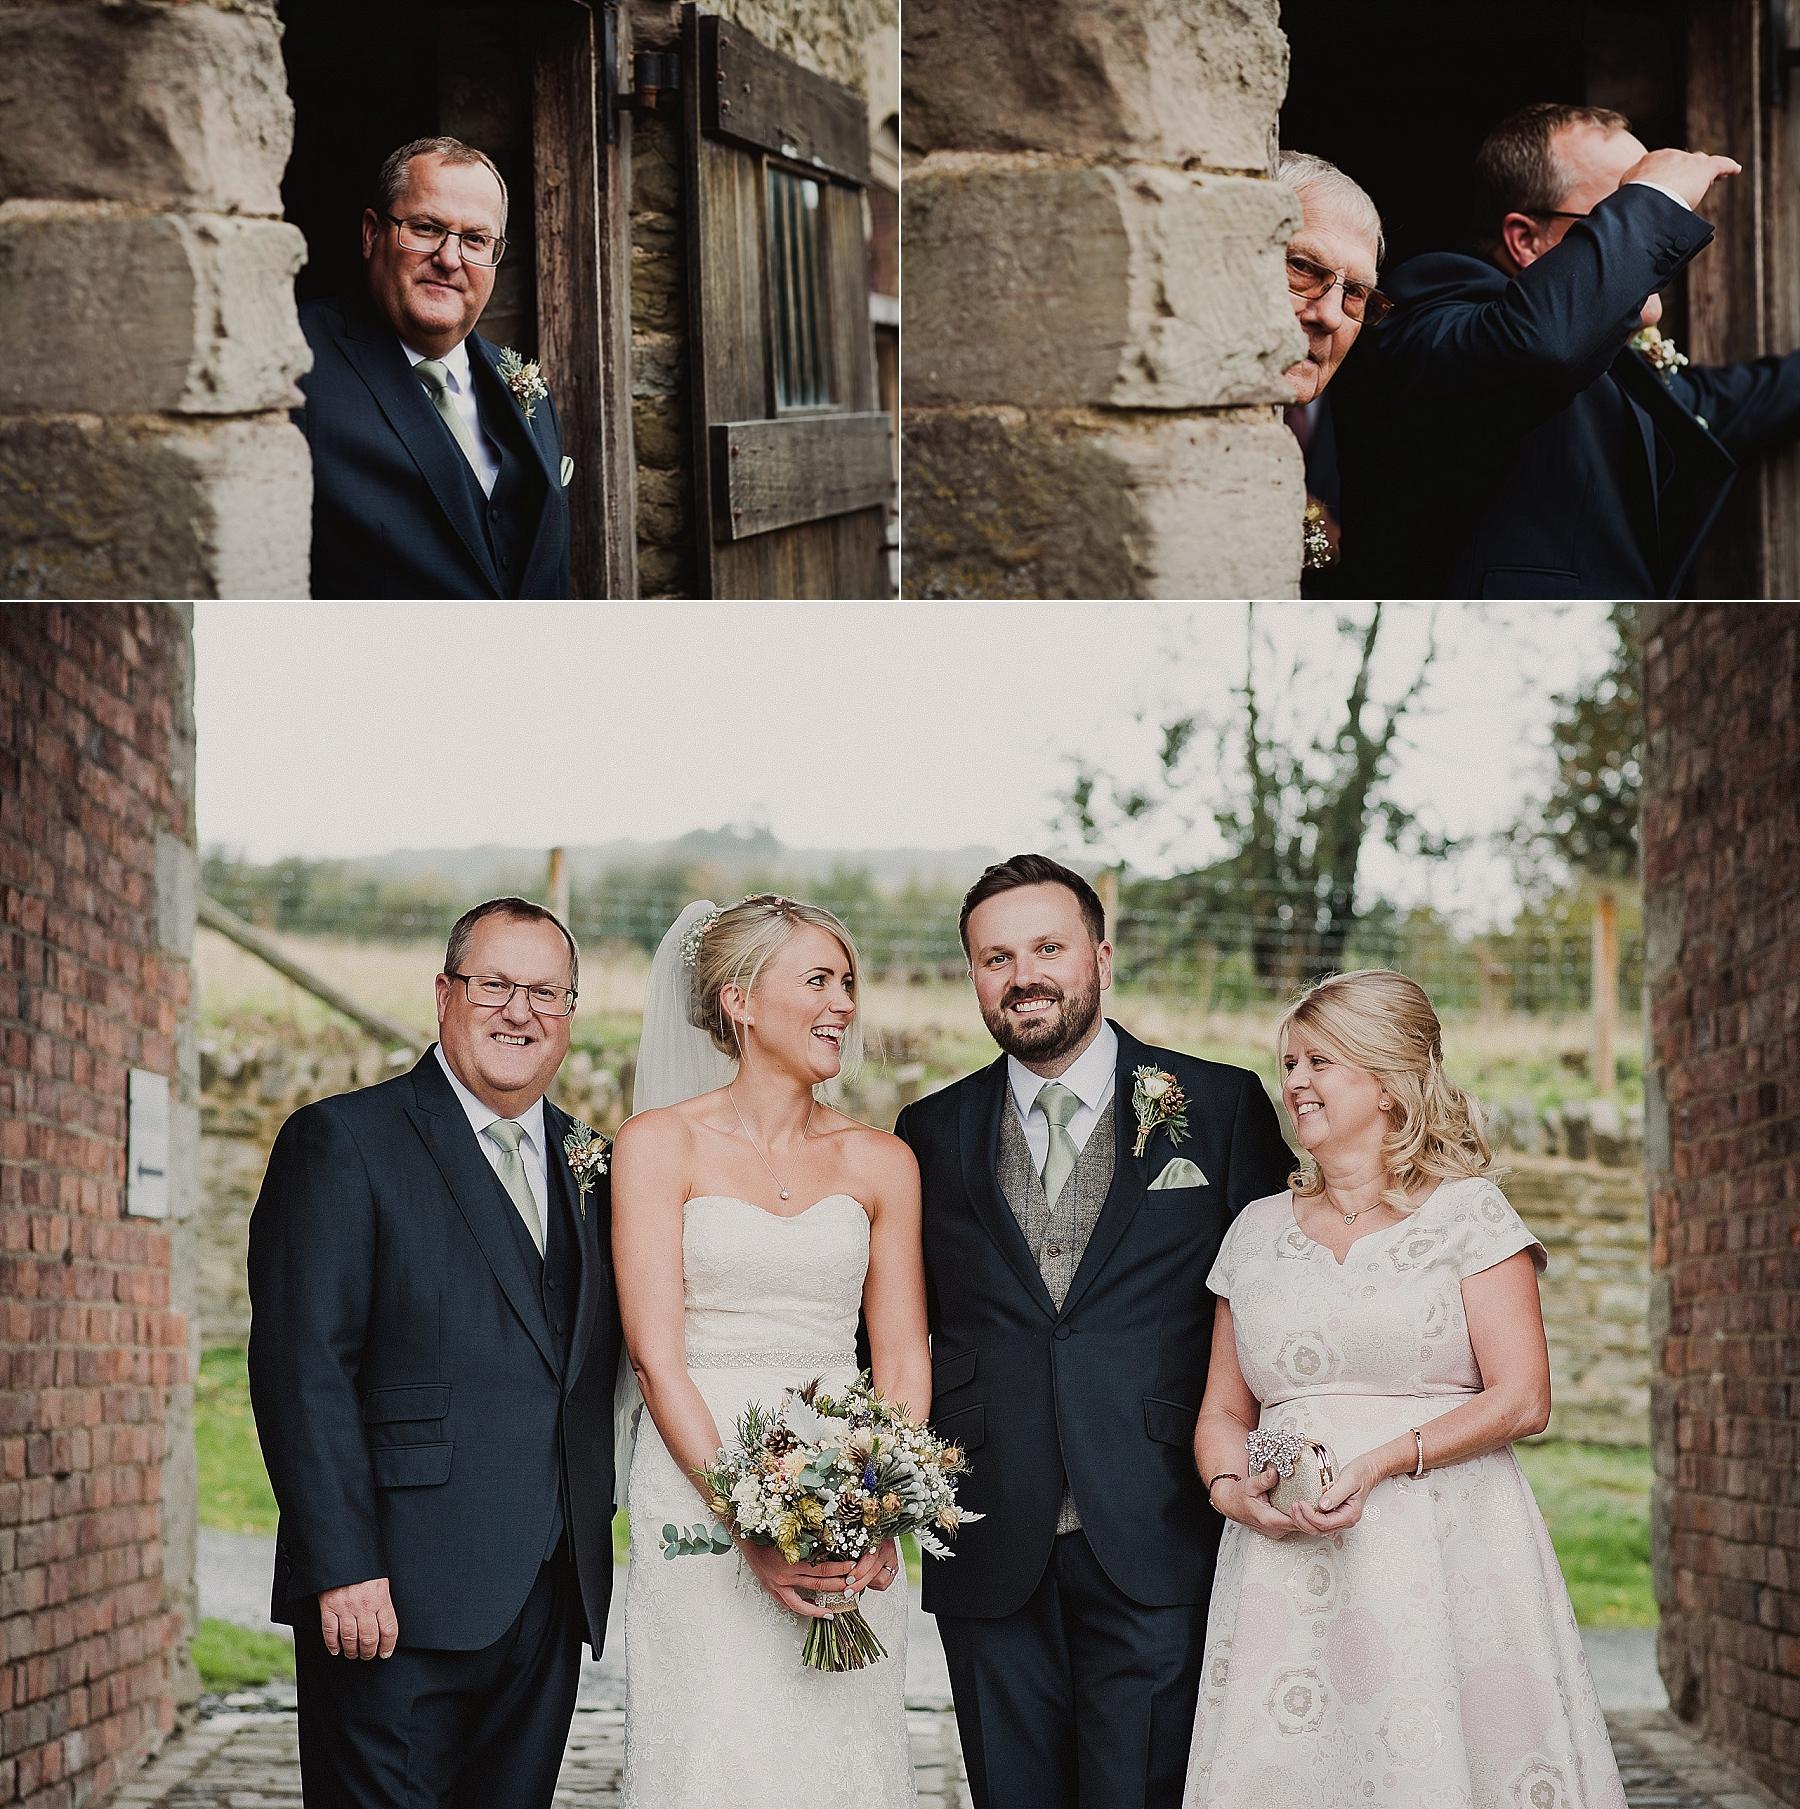 chris_keely_downton_lodge_wedding_0061.jpg